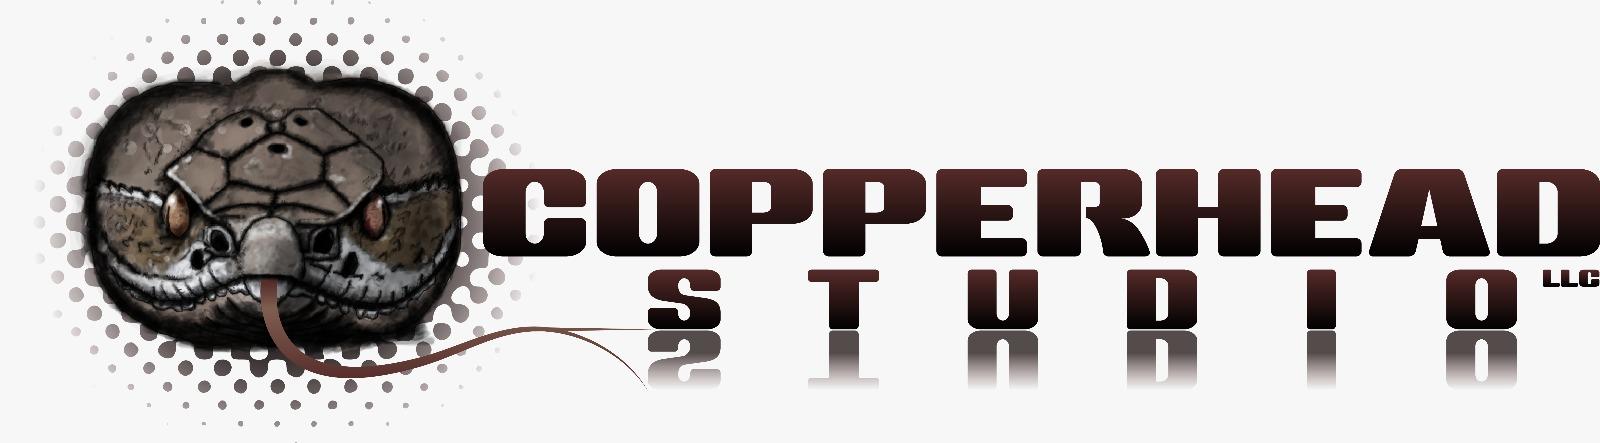 Copperhead Studio, LLC